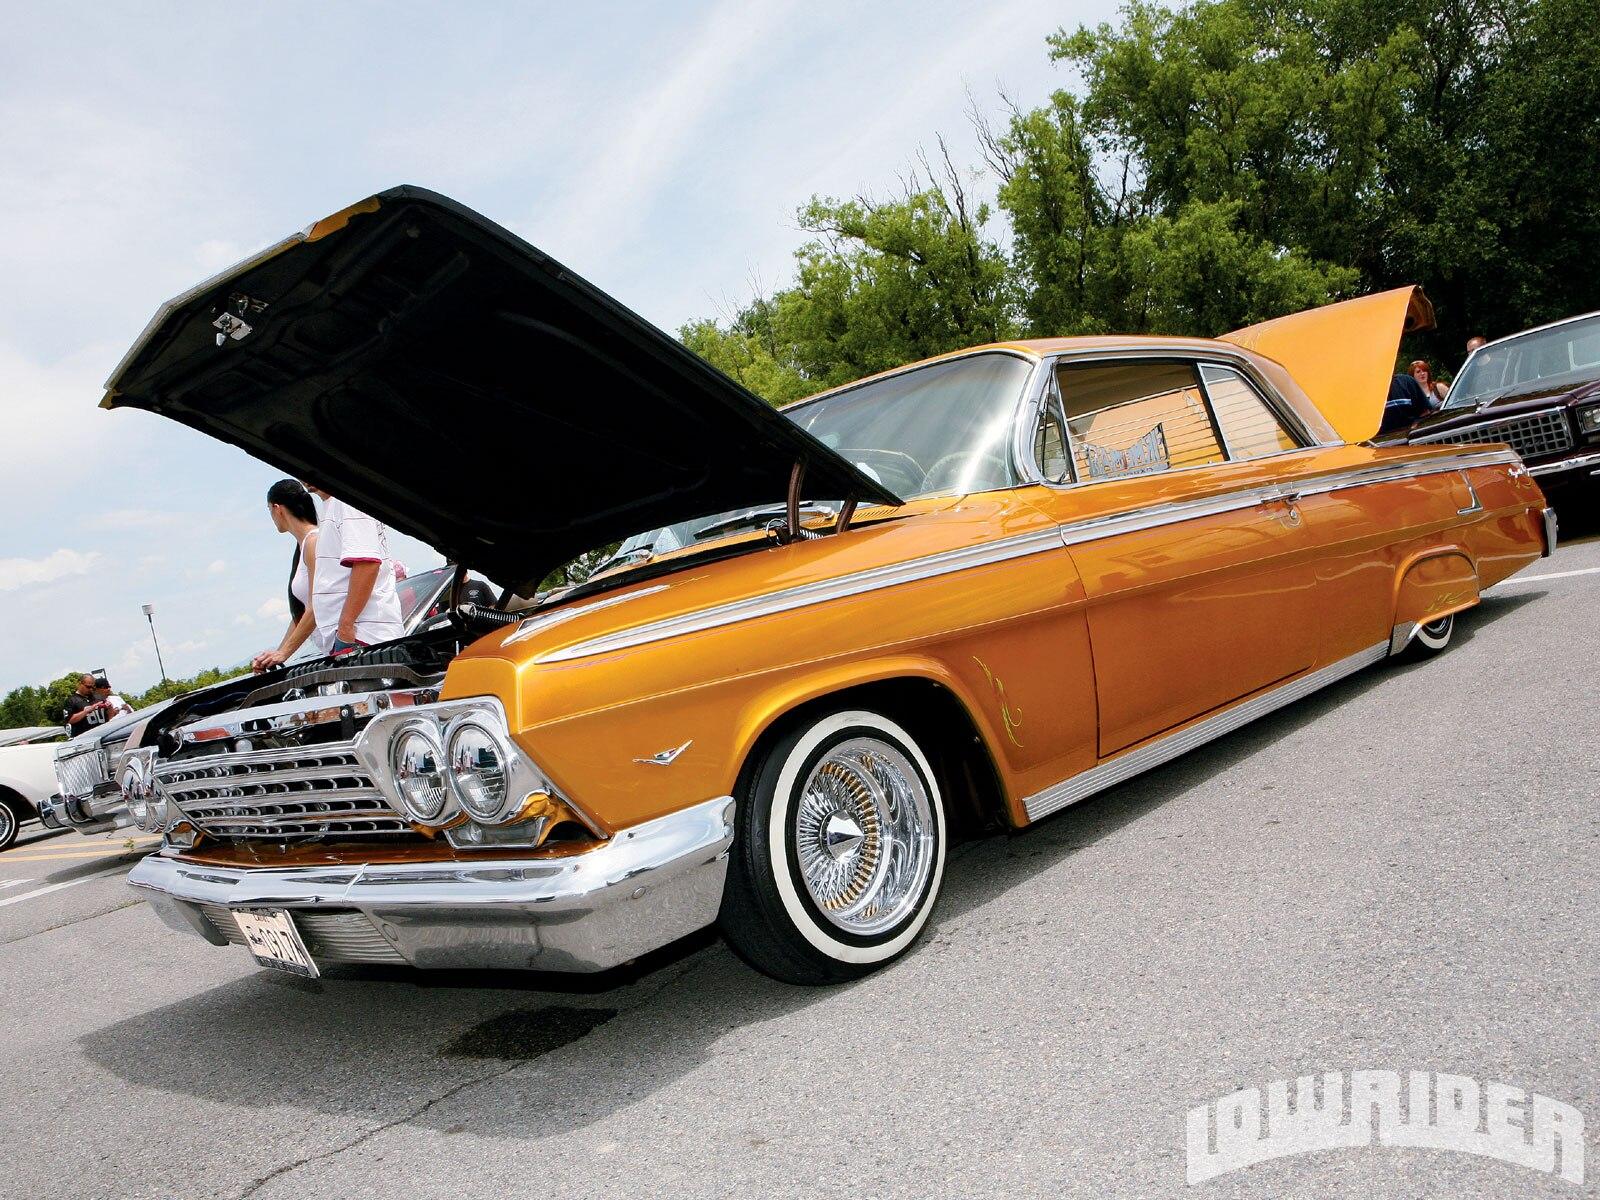 lrmp-1001-02-o-victors-tires-salt-lake-city-car-show-orange-impala2